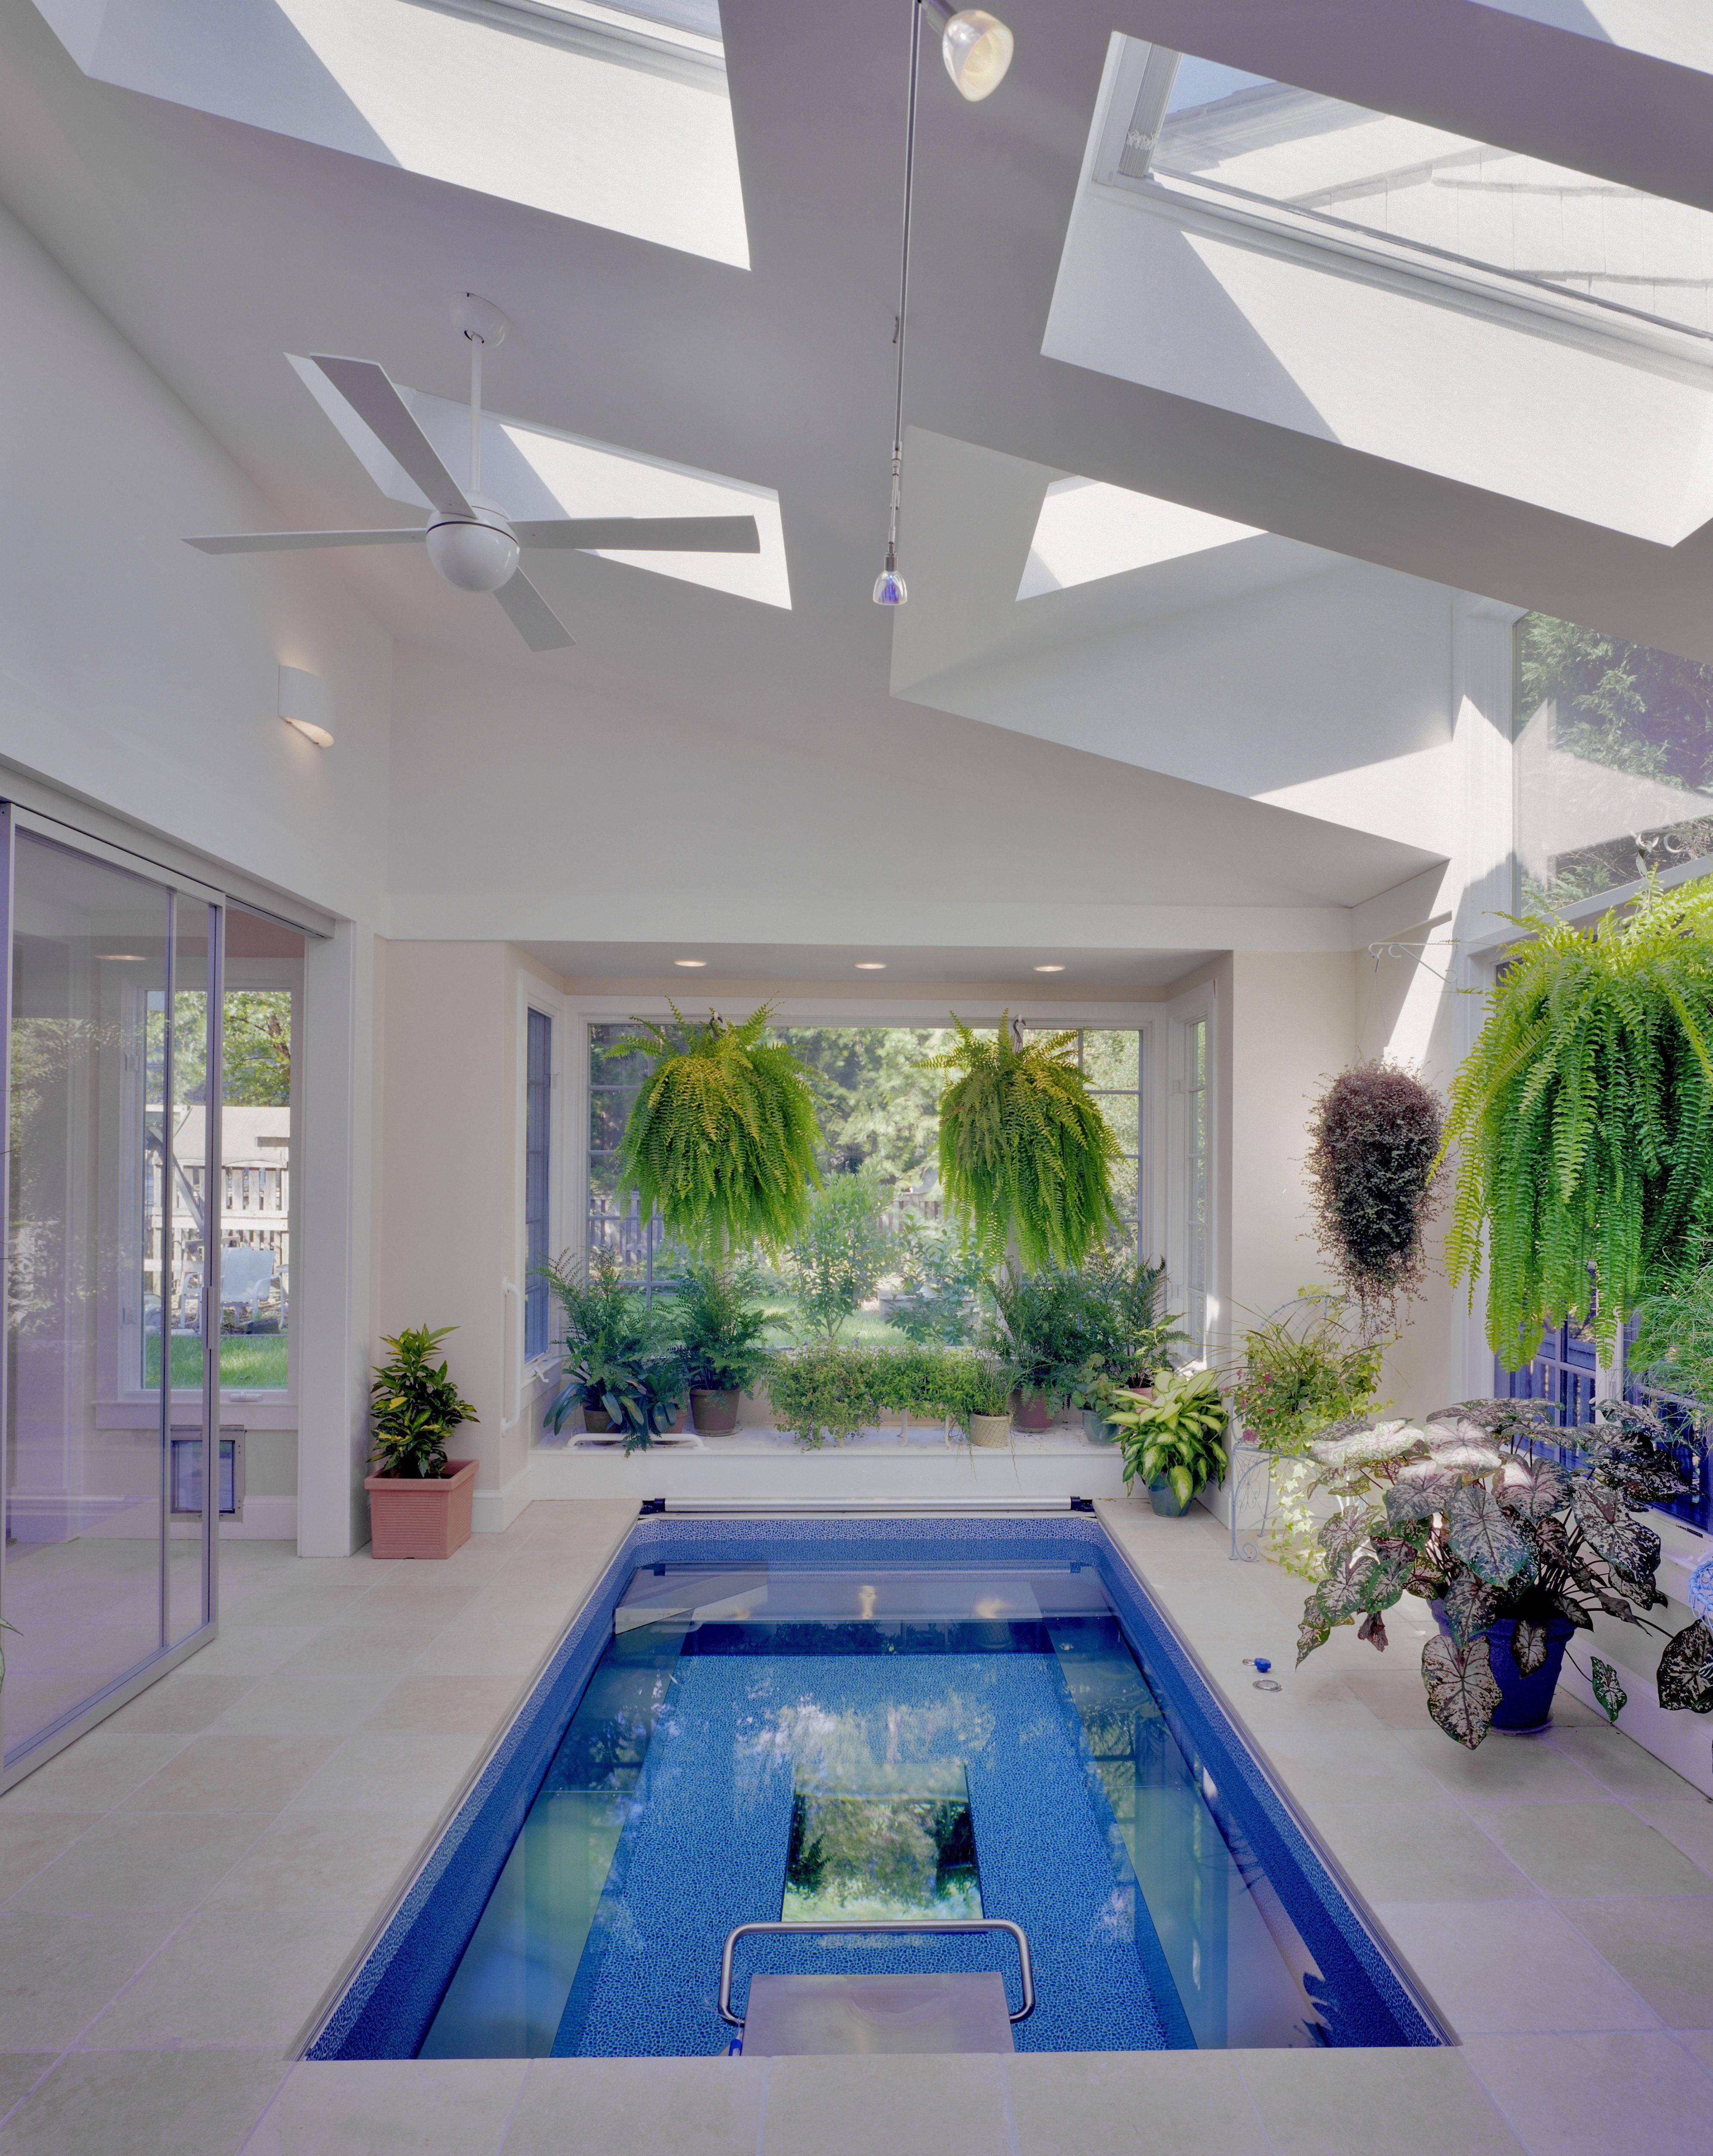 Pin By Endless Pools On Sunroom Ideas Small Indoor Pool Indoor Swimming Pool Design Luxury Swimming Pools